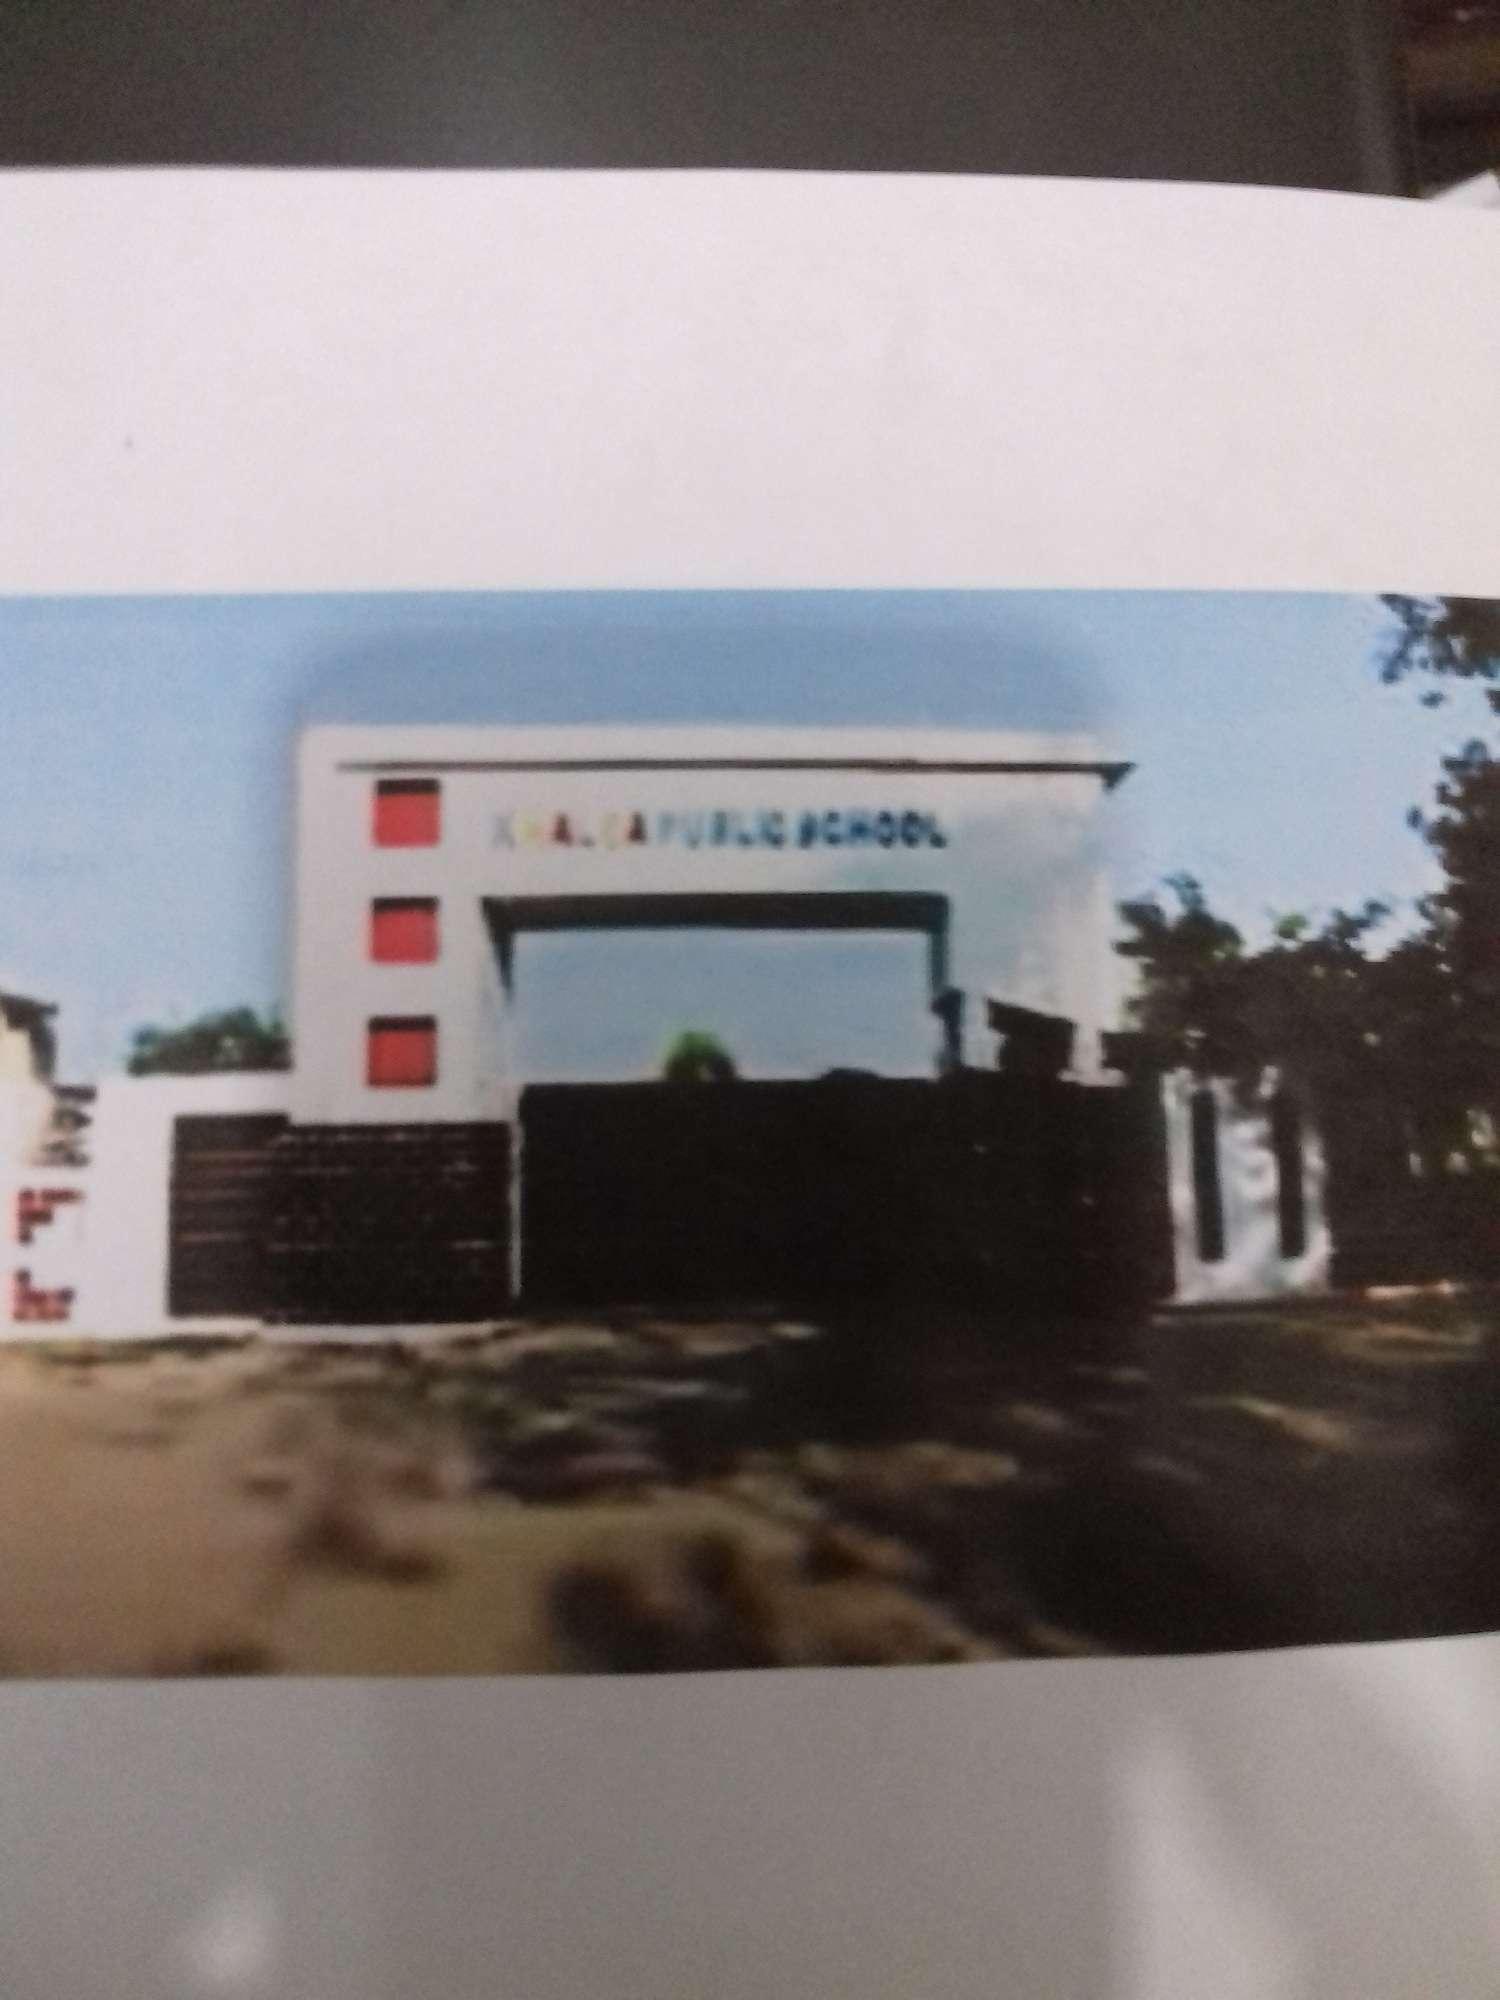 KHALSA PUBLIC SCHOOL SARAK DOODHLI DEHRADUN ROAD SAHARANPUR UTTAR PRADESH 2130484